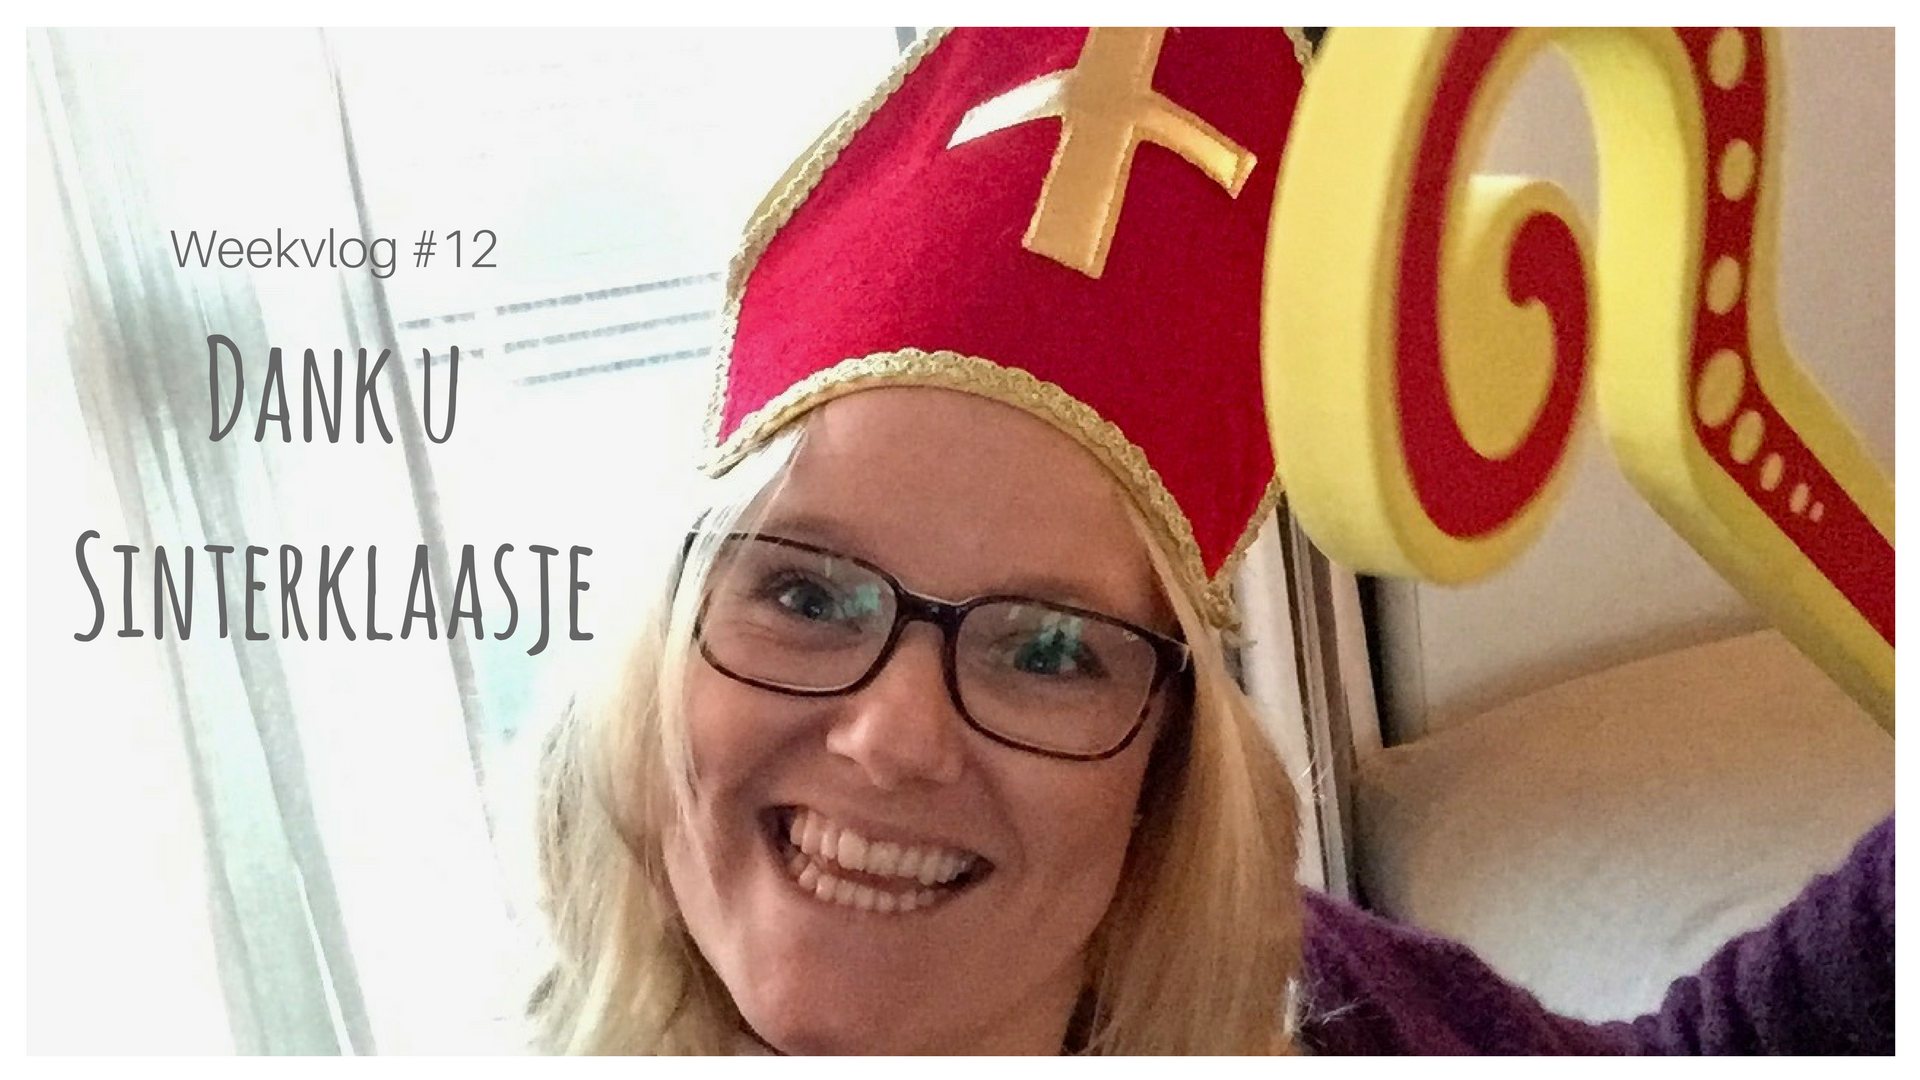 Weekvlog 13 Dank u Sinterklaasje